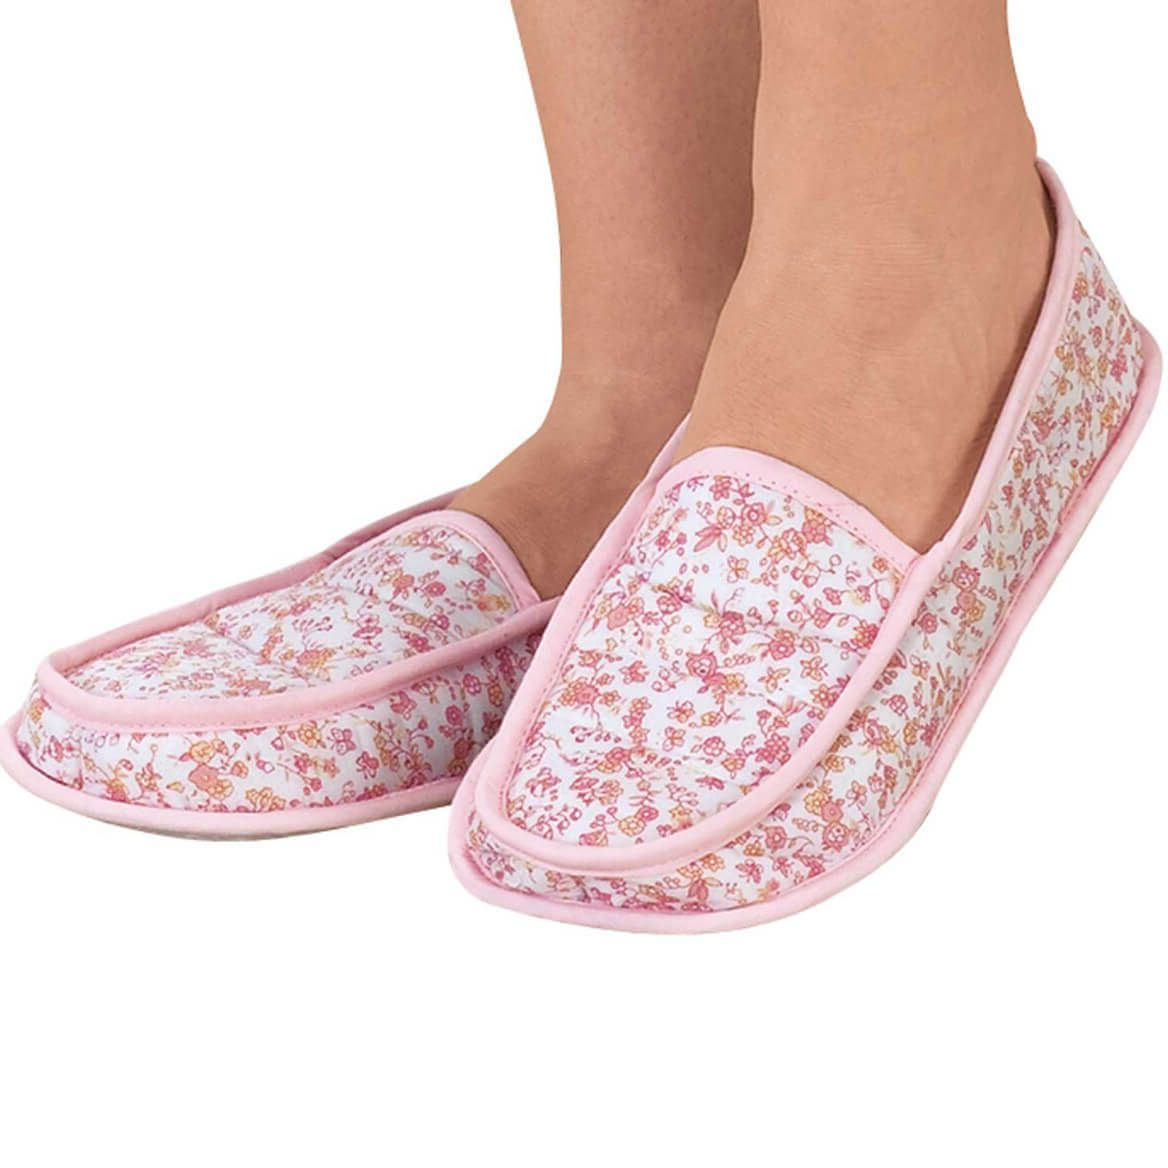 Soft Slippers - Chintz-303161